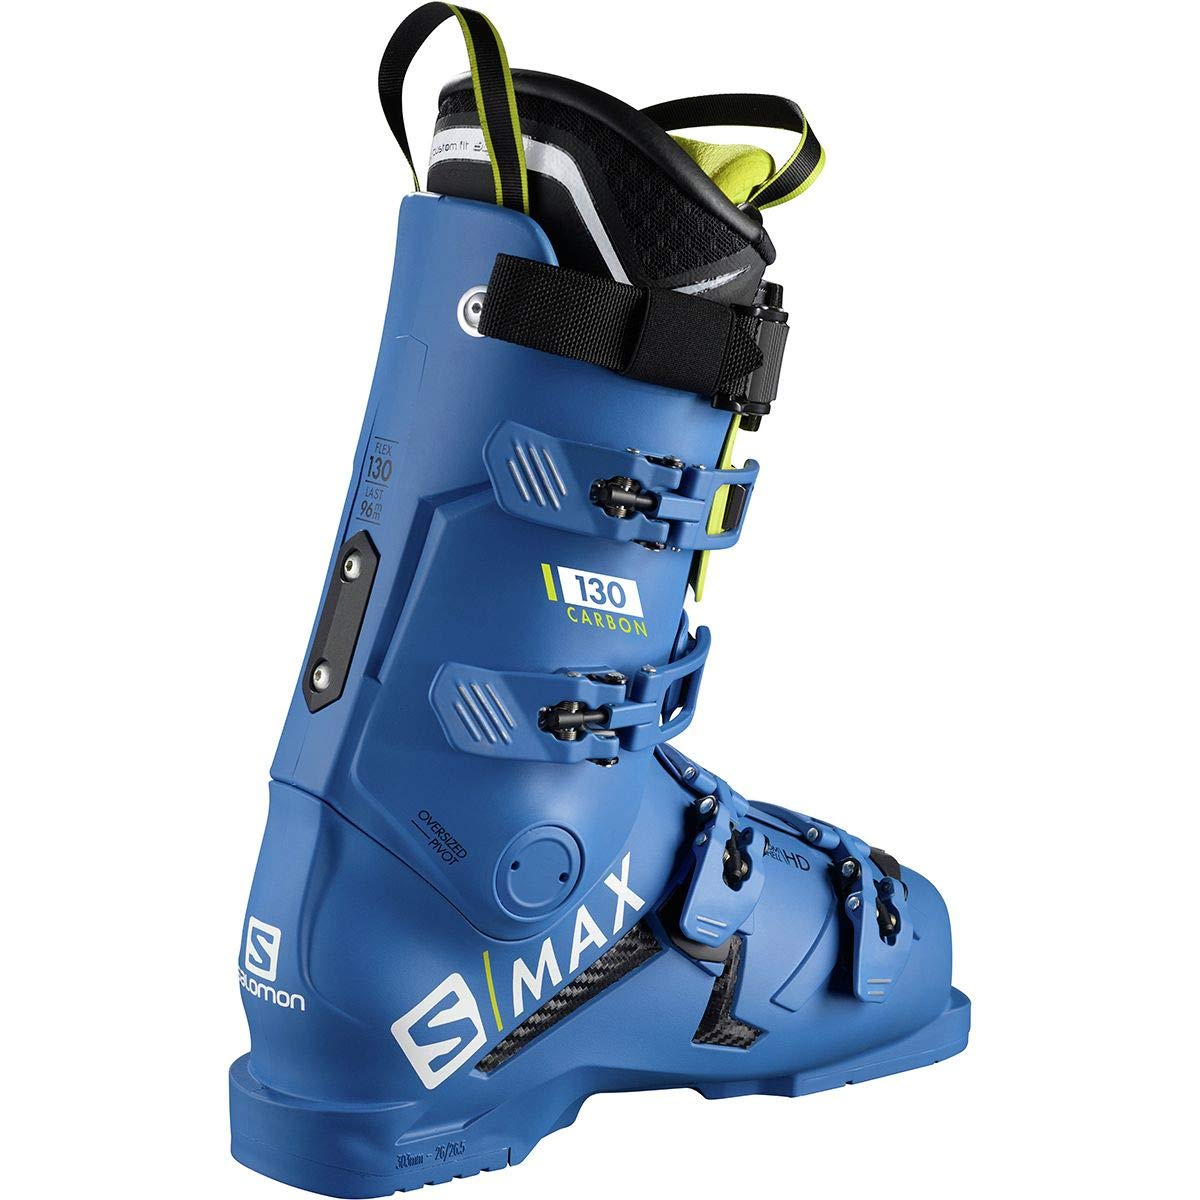 : Salomon SMax 130 Carbon Alpine Ski Boot